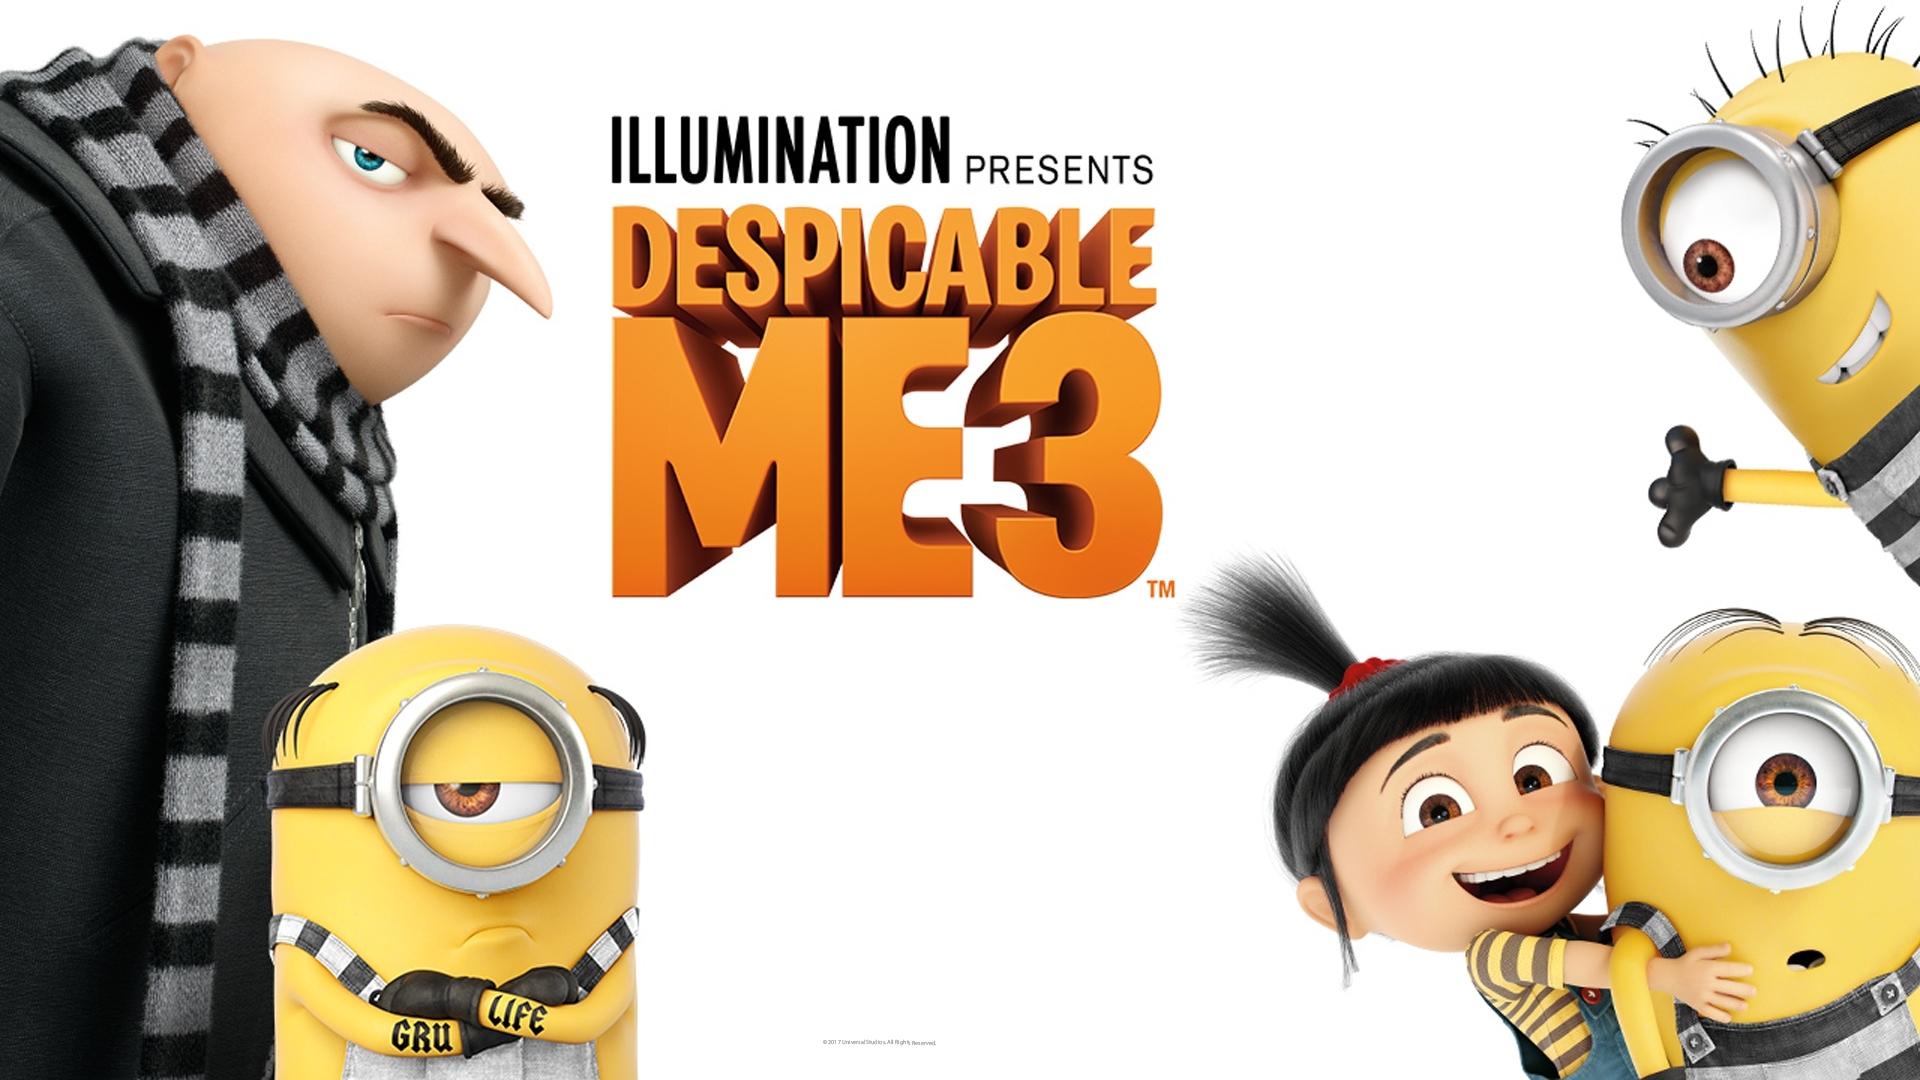 Despicable Me 3 มิสเตอร์แสบ ร้ายเกินพิกัด 3